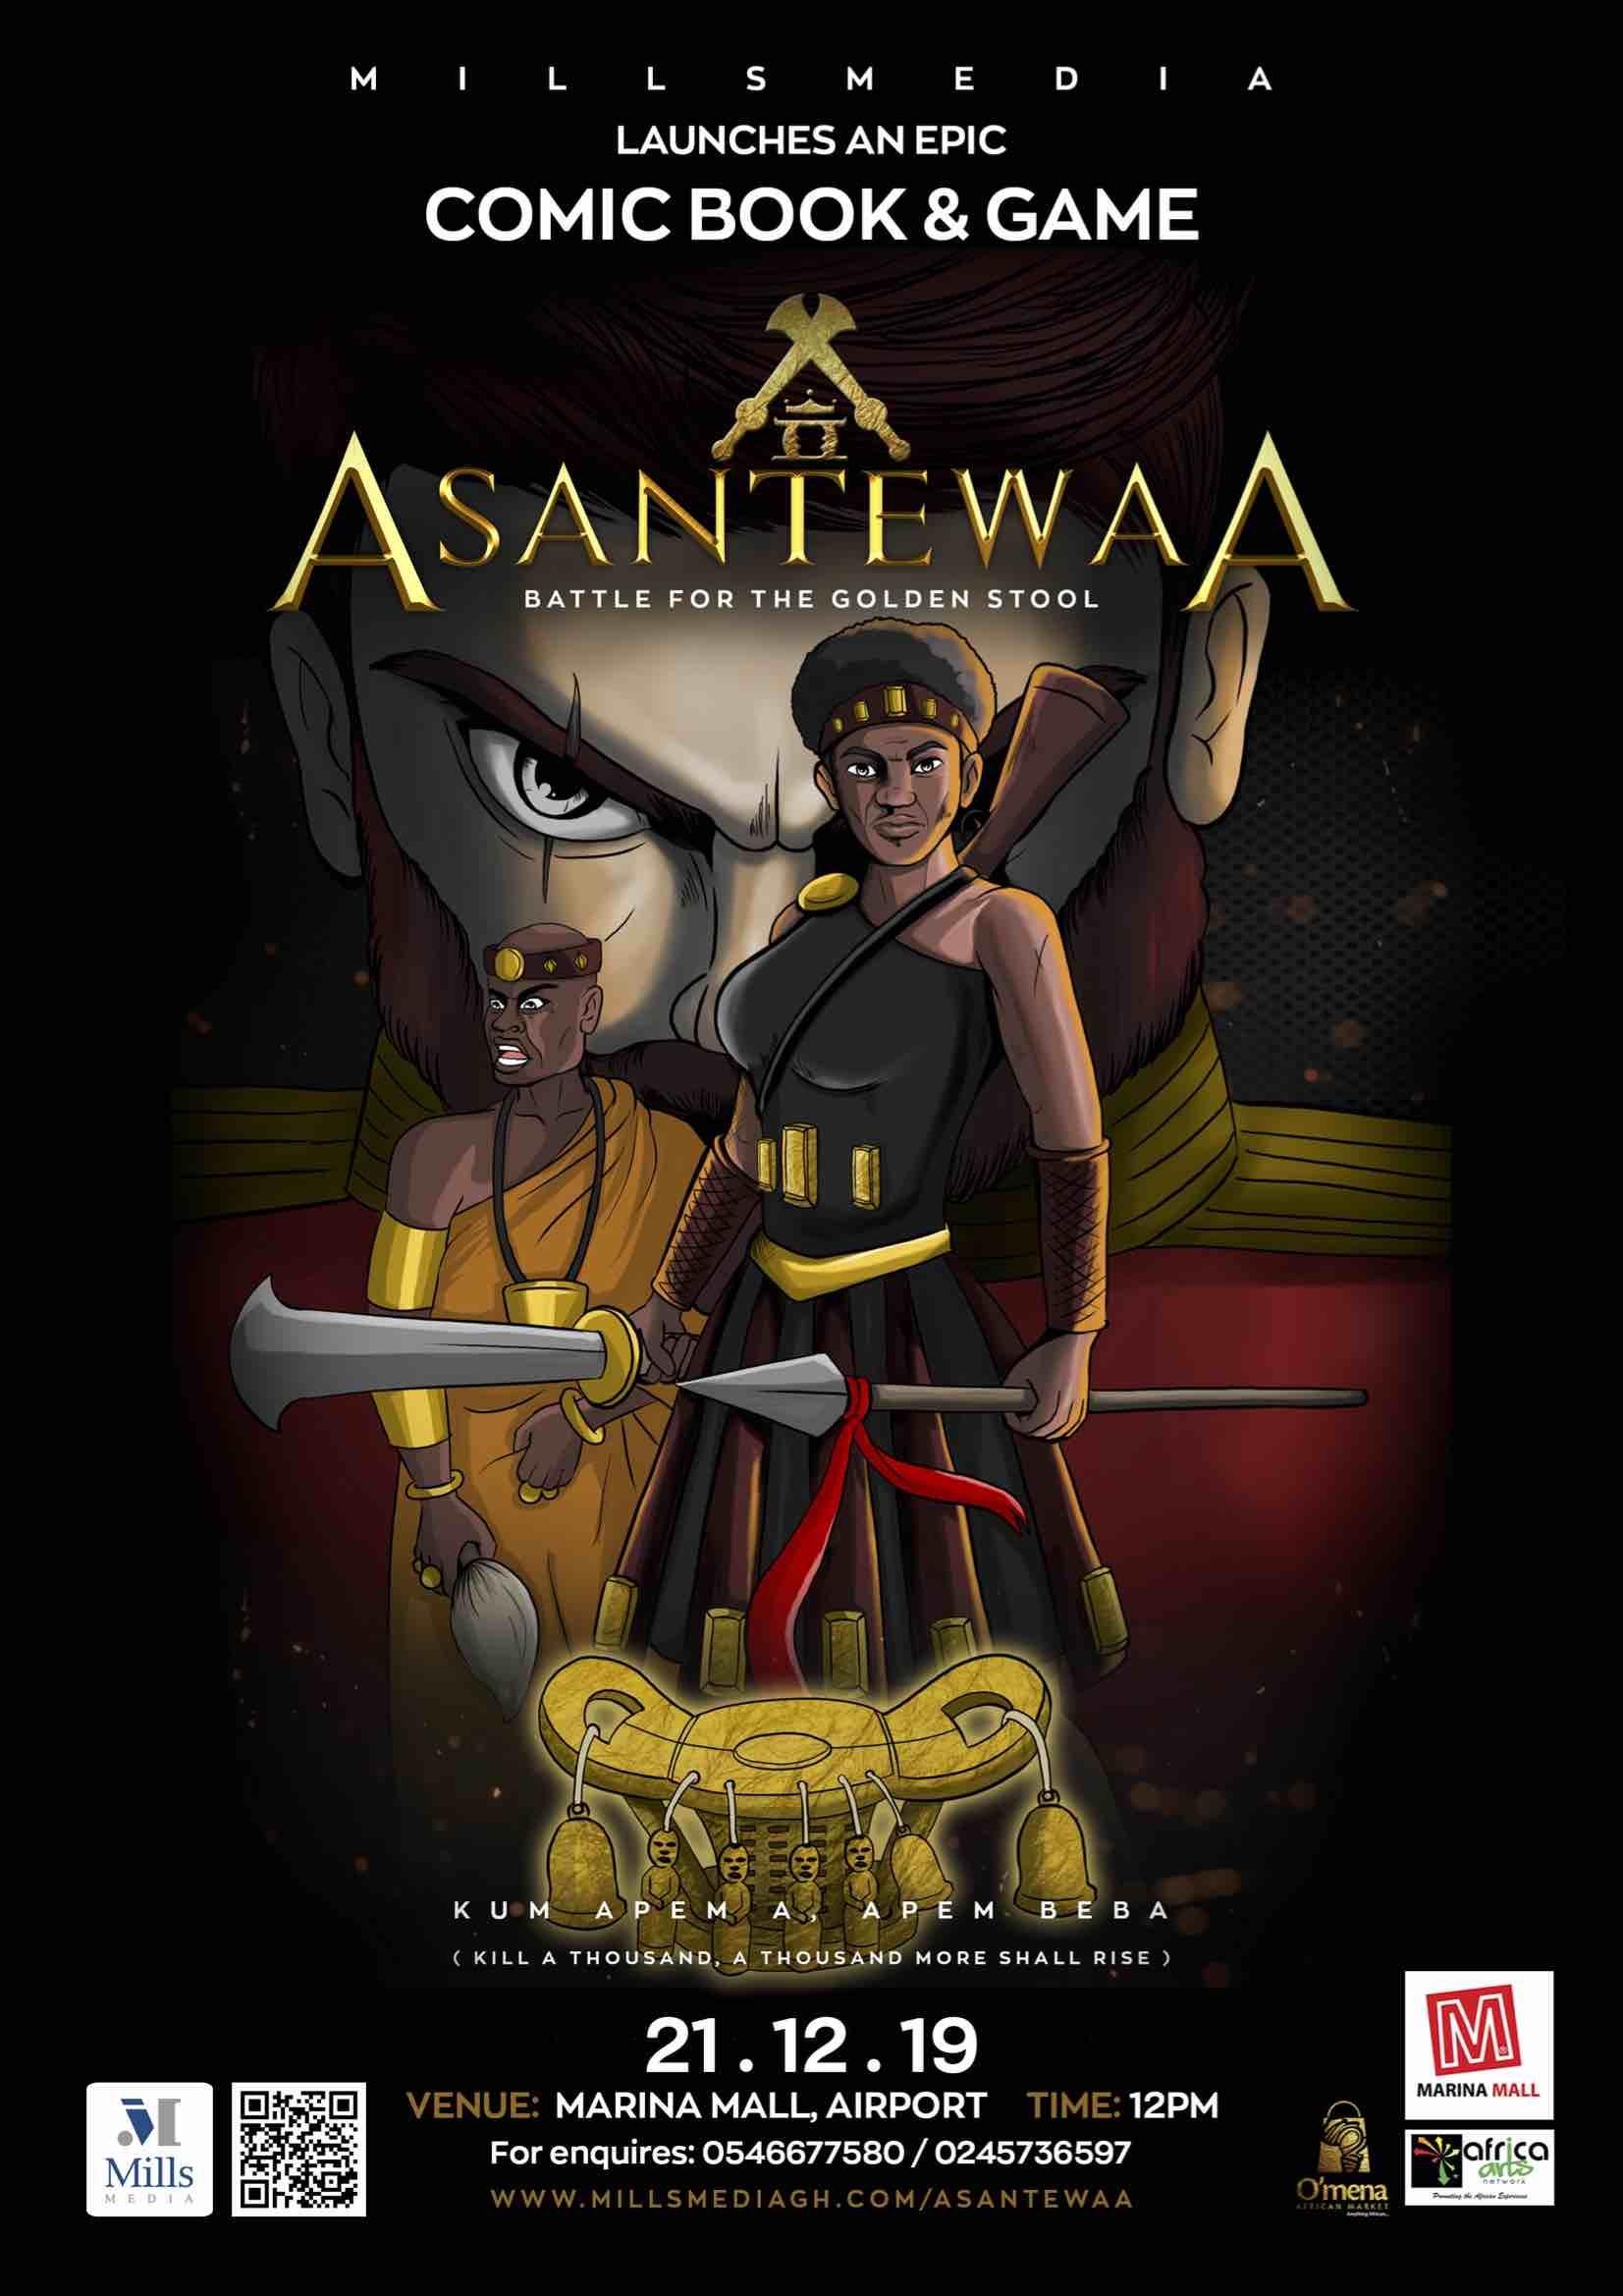 Asantewaa